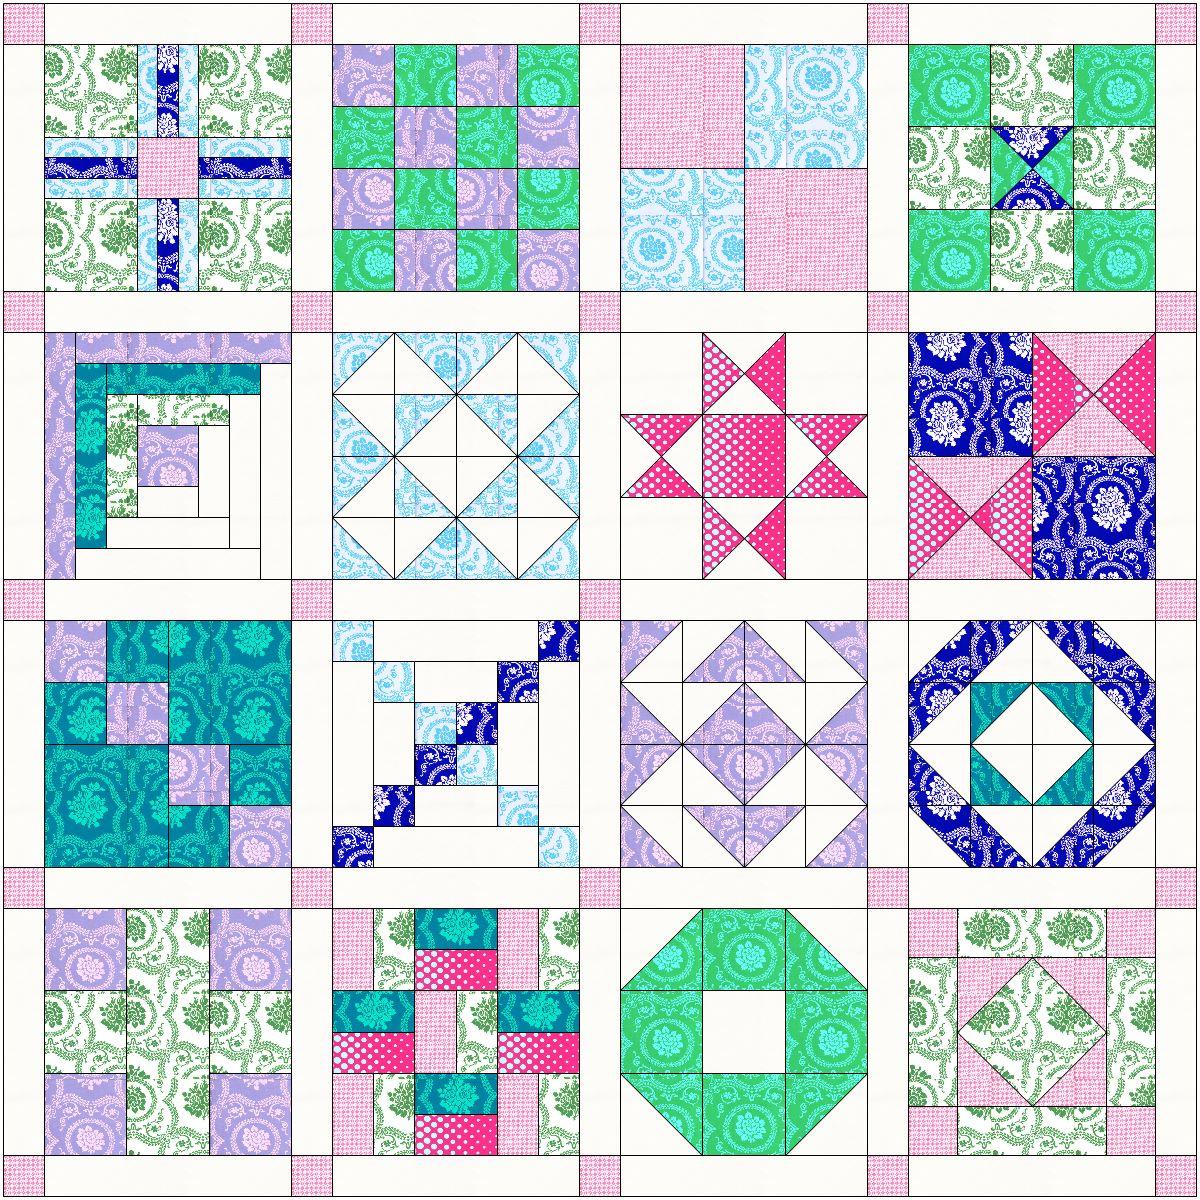 Simple Sampler Quilt Along Details - Amy's Creative Side : the quilt sampler - Adamdwight.com